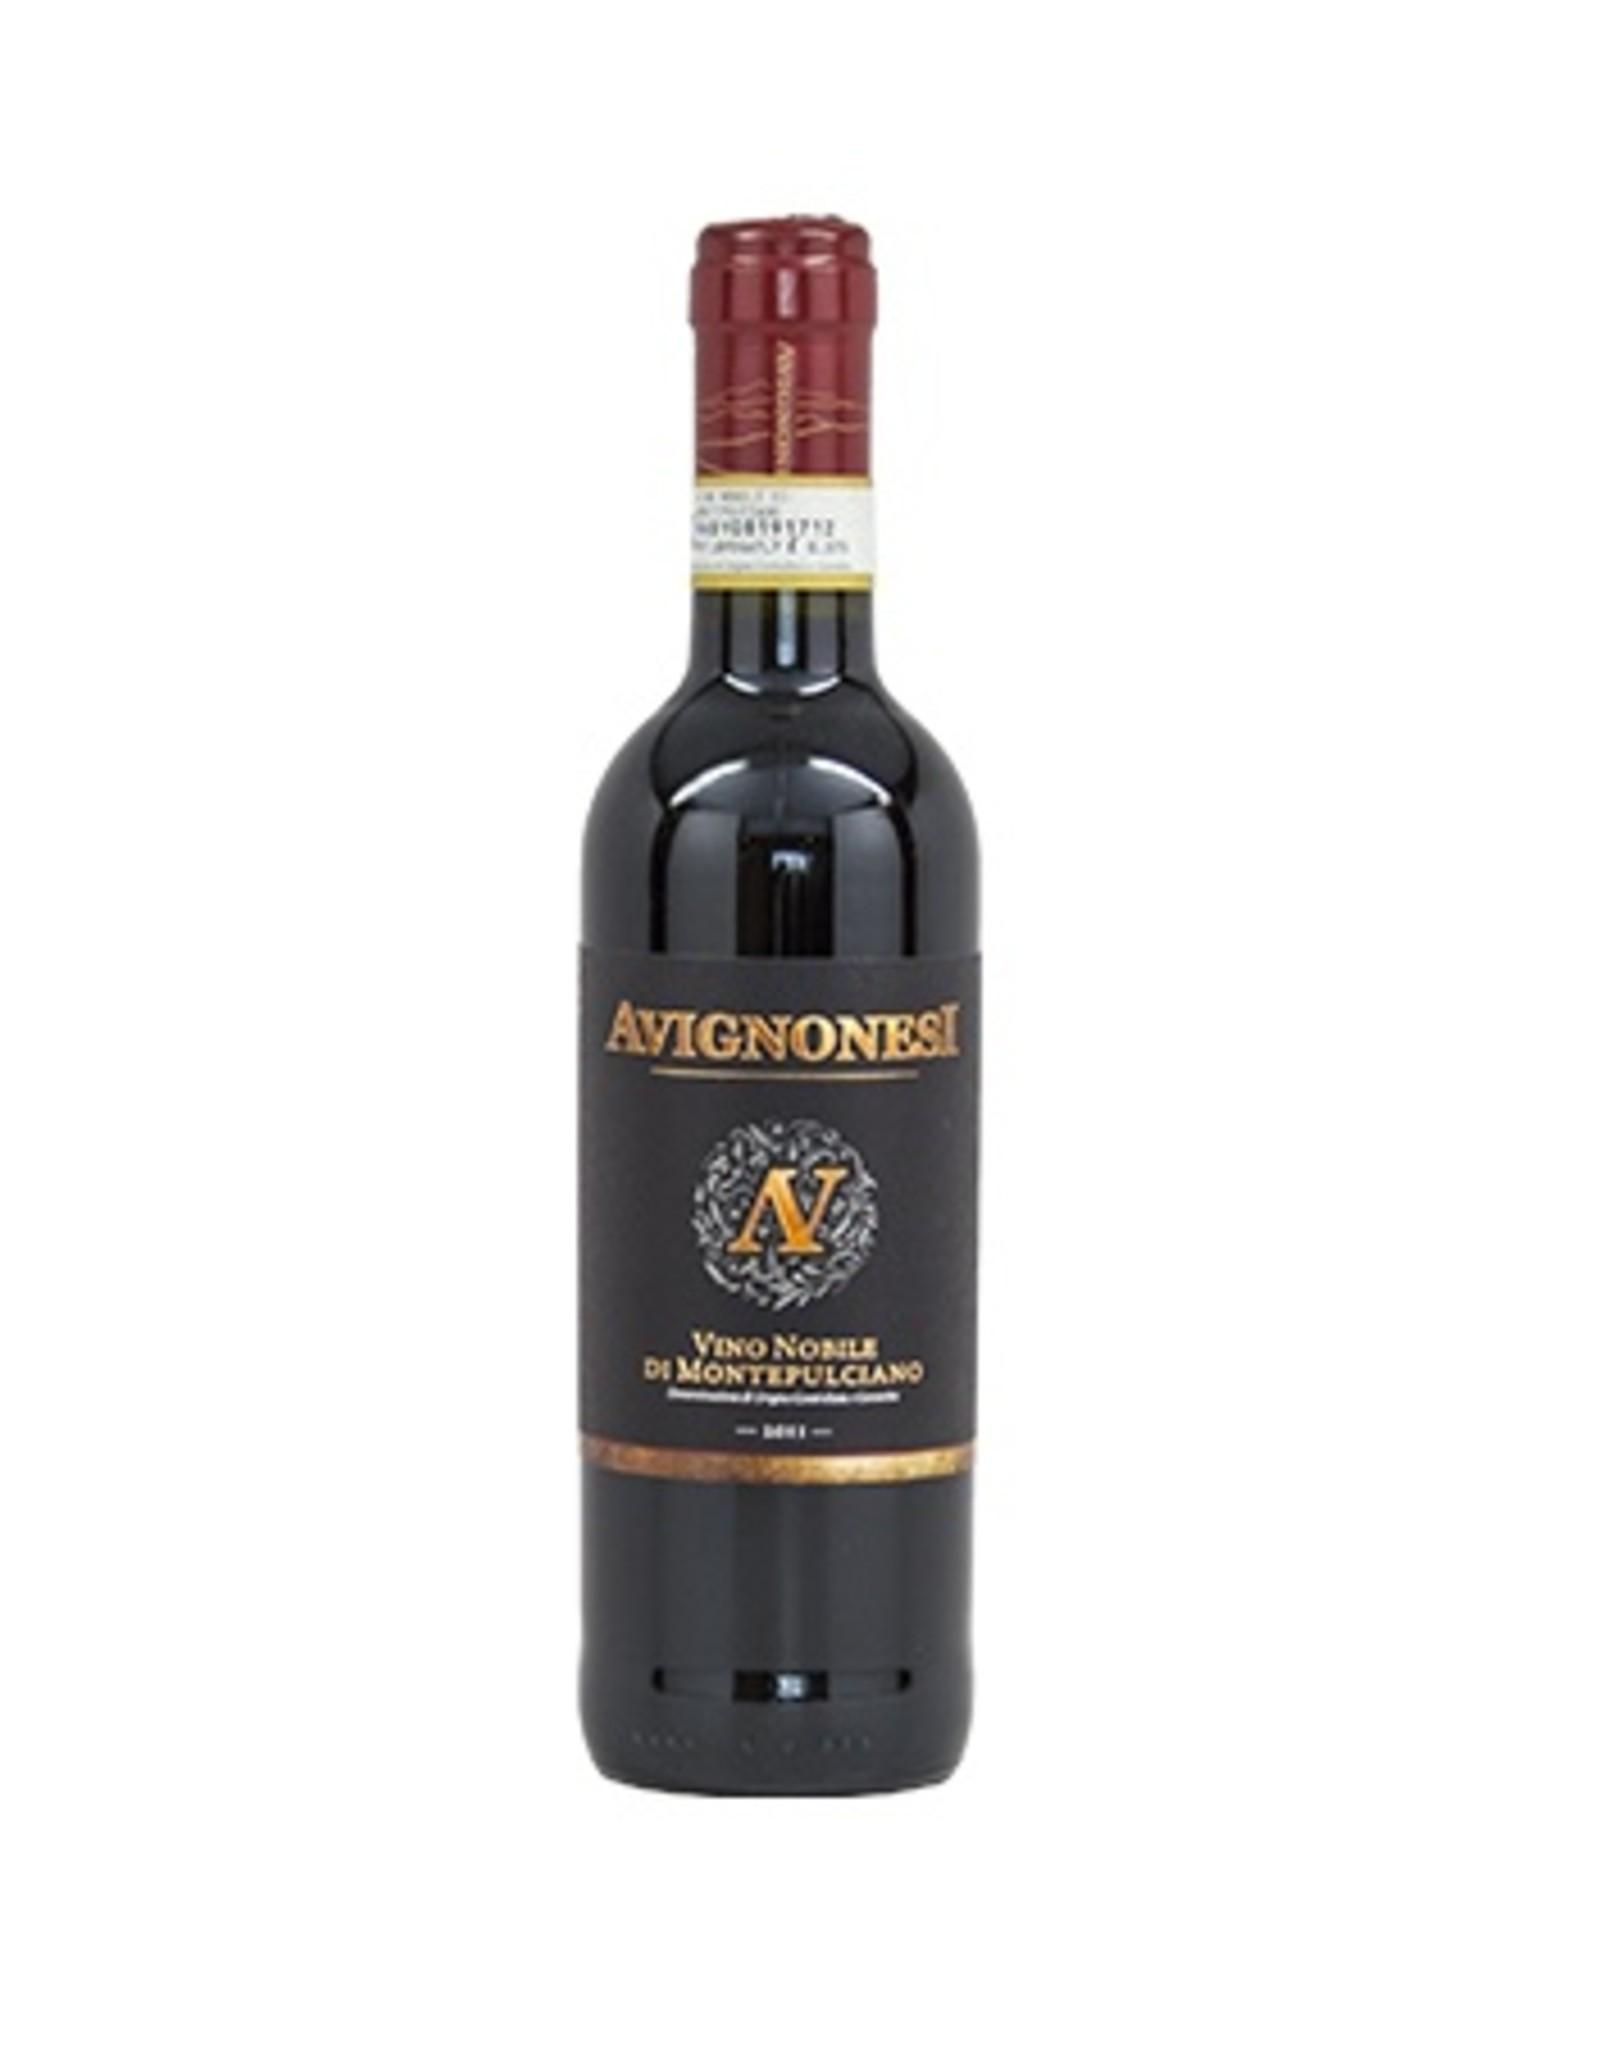 Avignonesi Vino Nobile Montepulciano 2015